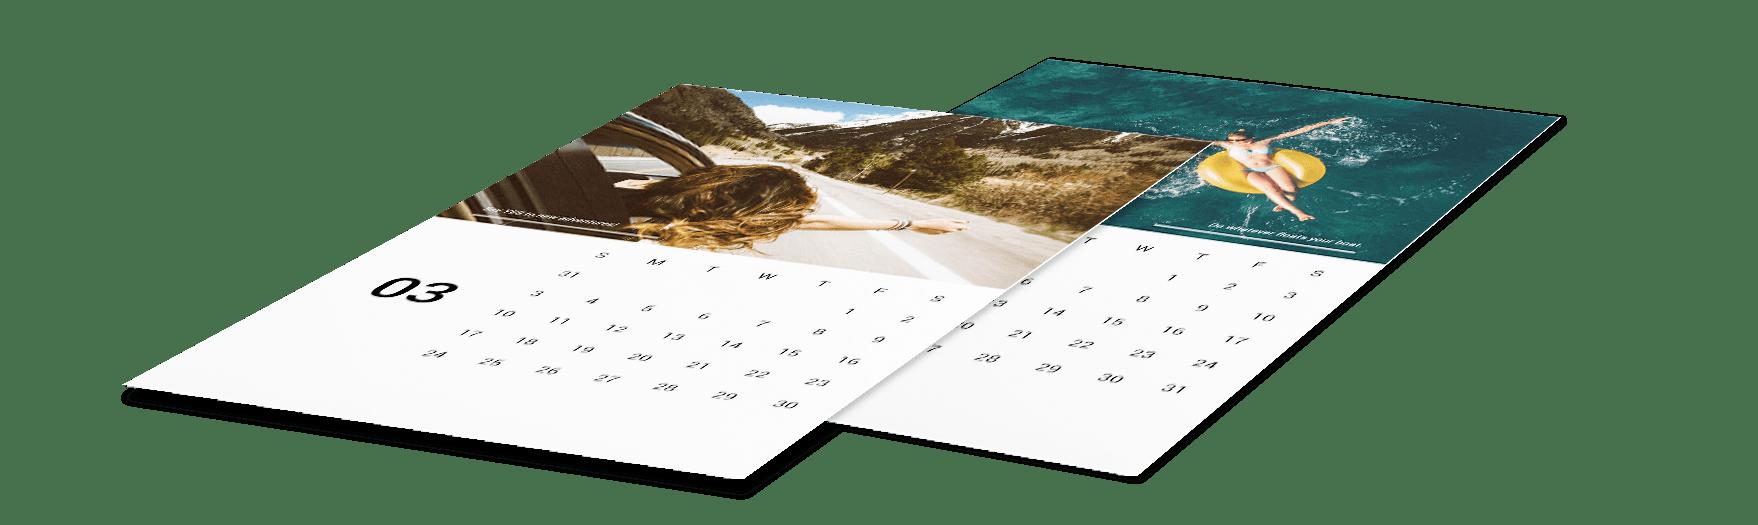 Custom Photo Calendars Worldwide Make